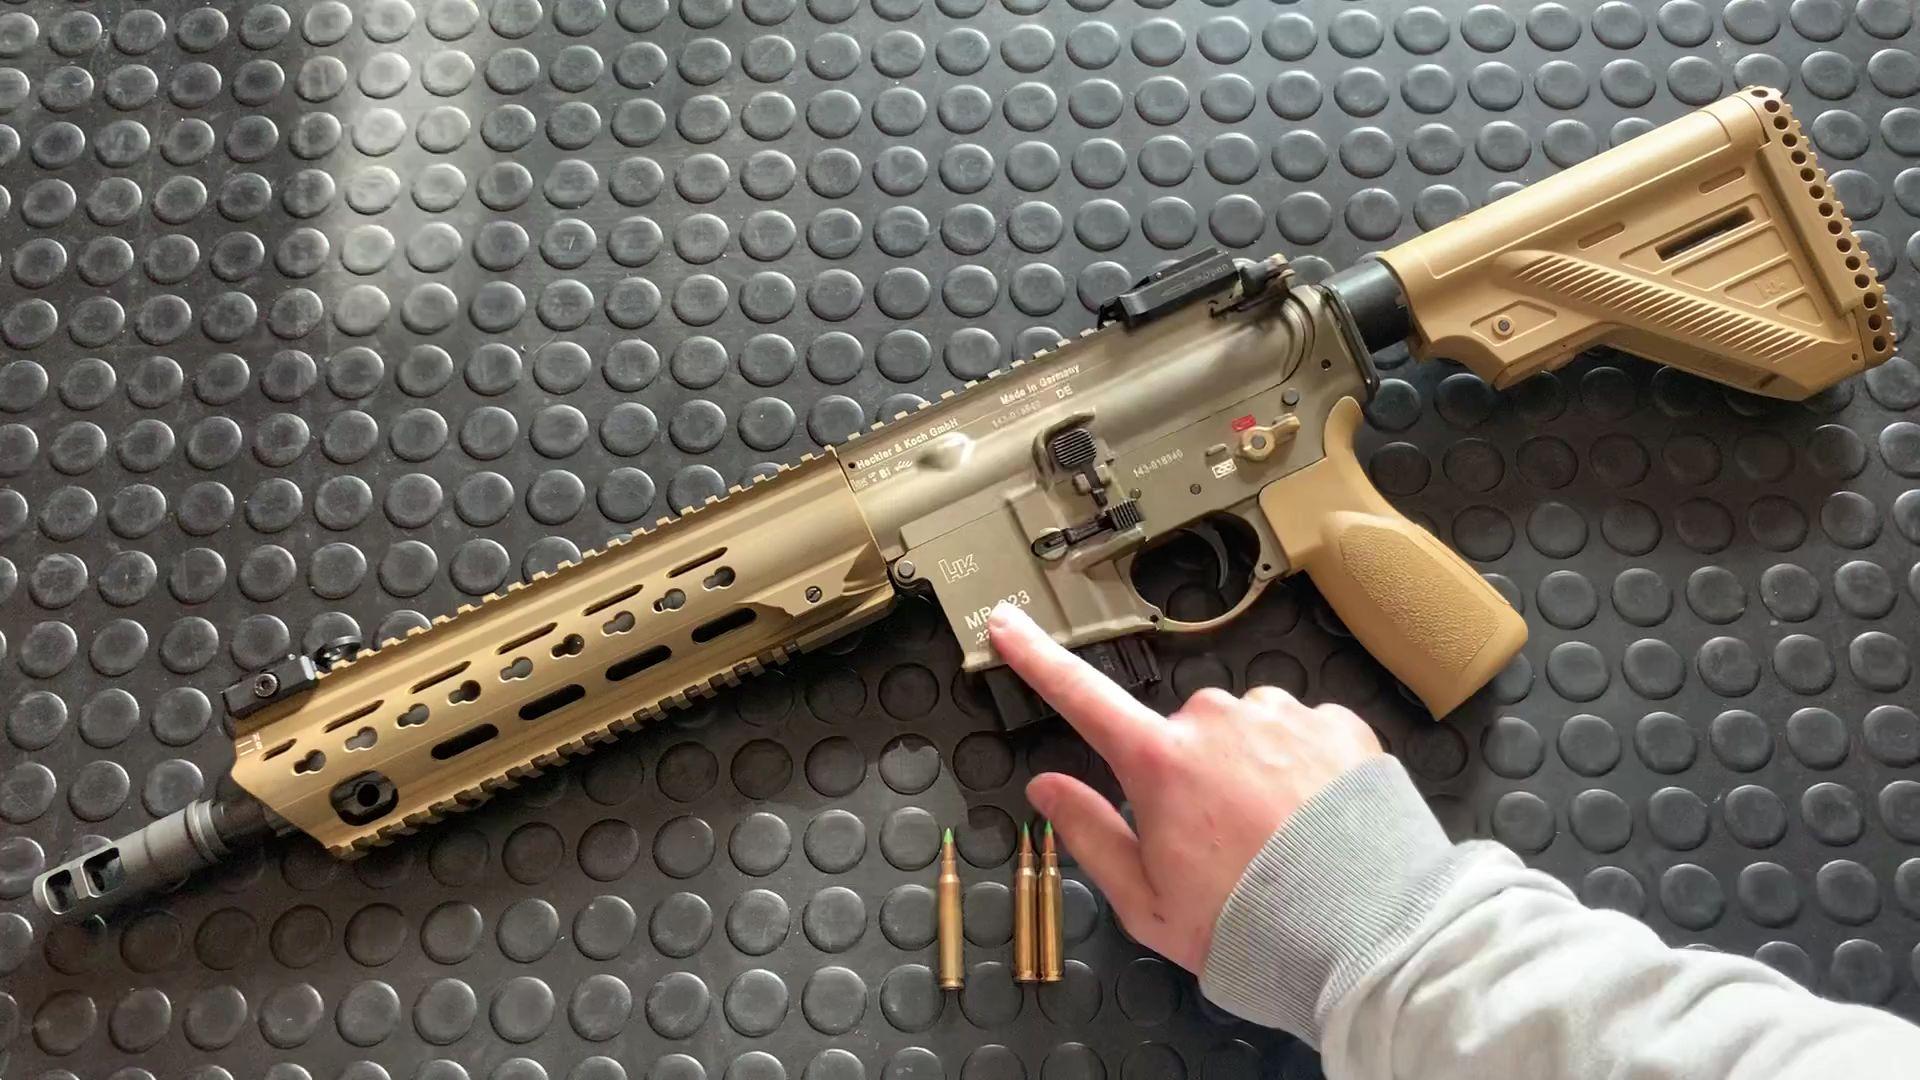 MR223A3步枪评测 hk416步枪民用版本